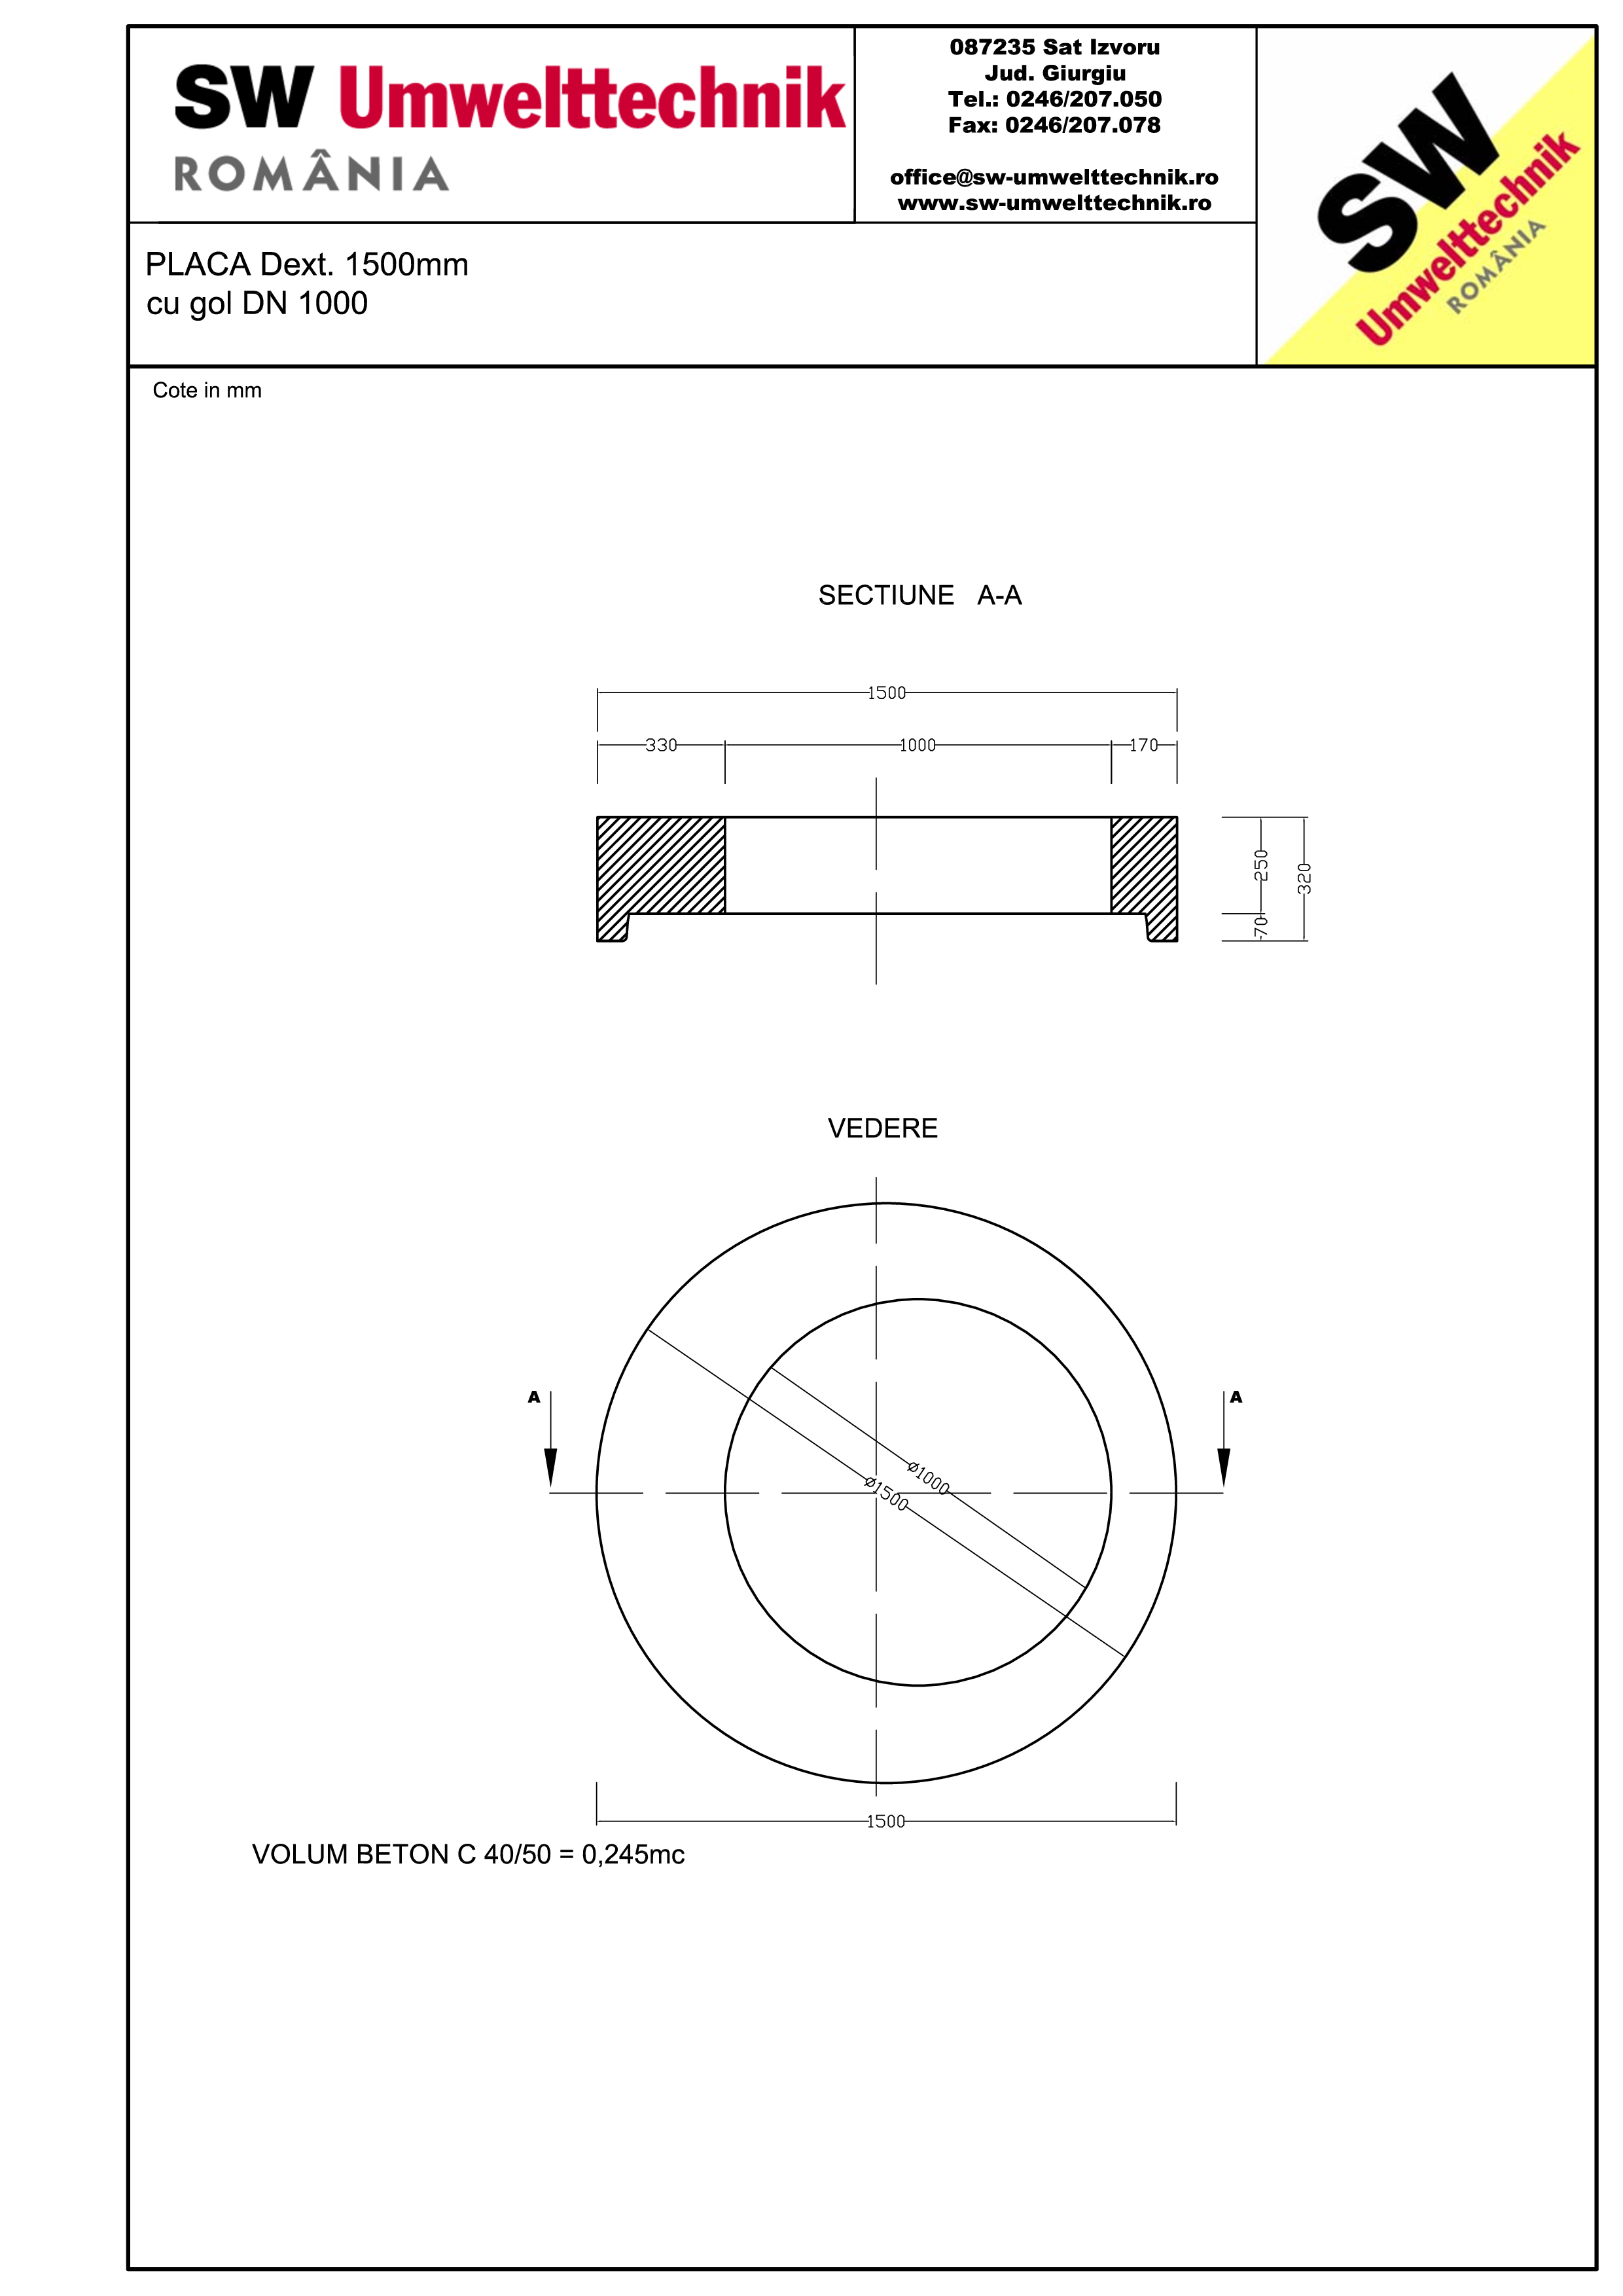 Pagina 1 - CAD-PDF Placa  Dext.1500 H250 cu gol DN1000 SW UMWELTTECHNIK Detaliu de produs